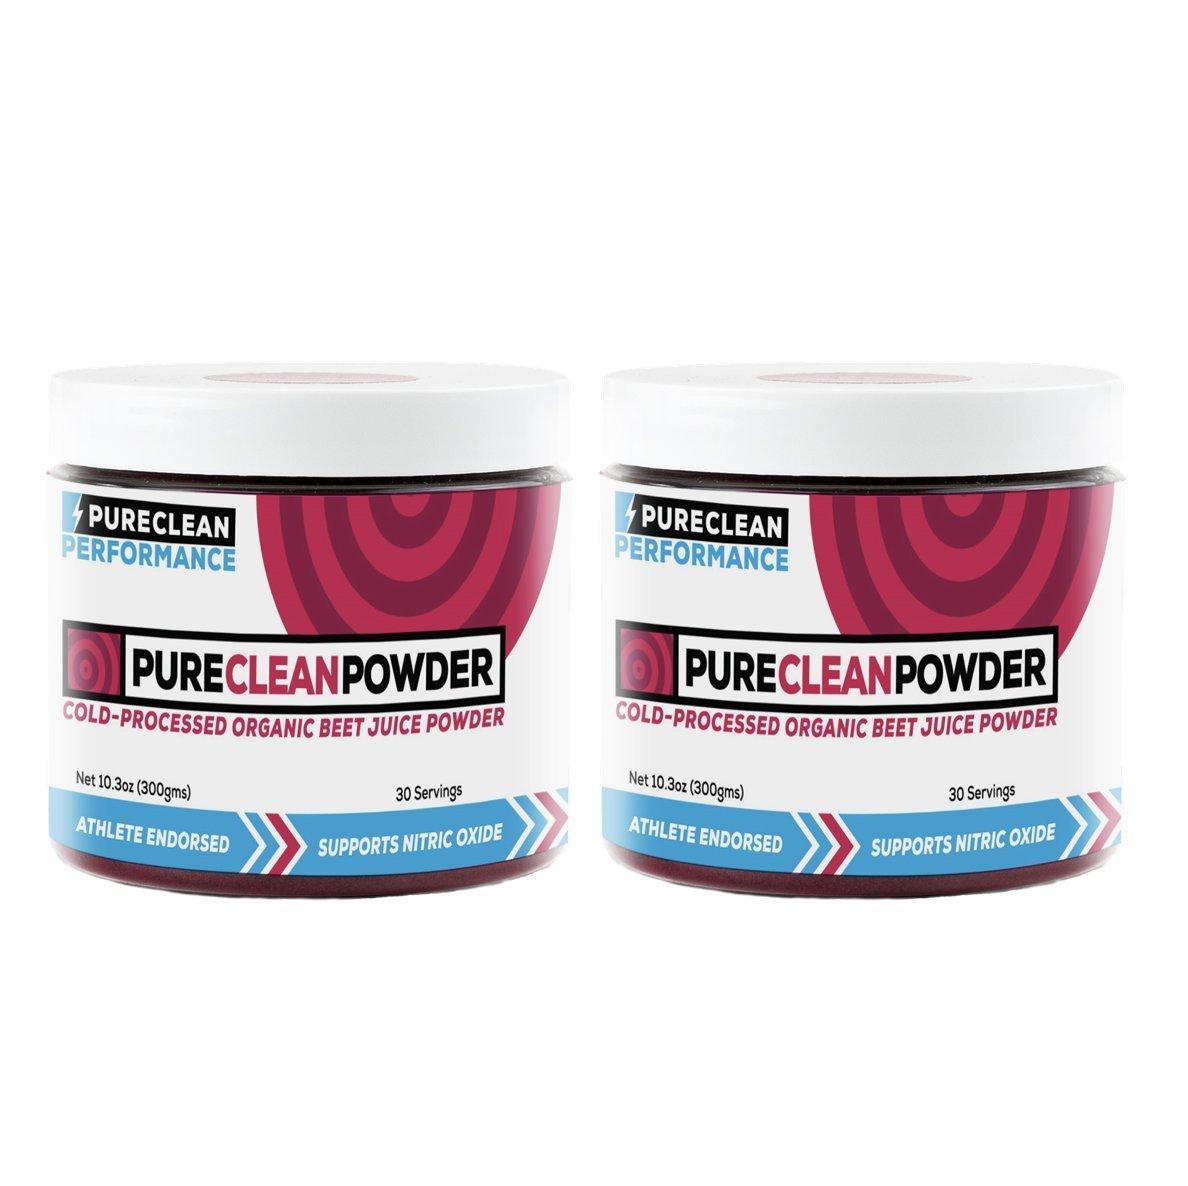 PureClean Powder - 100% USA Grown Organic Beet Juice Powder - No Fillers, Sweeteners, or Additives (PCP Jar 2pk)